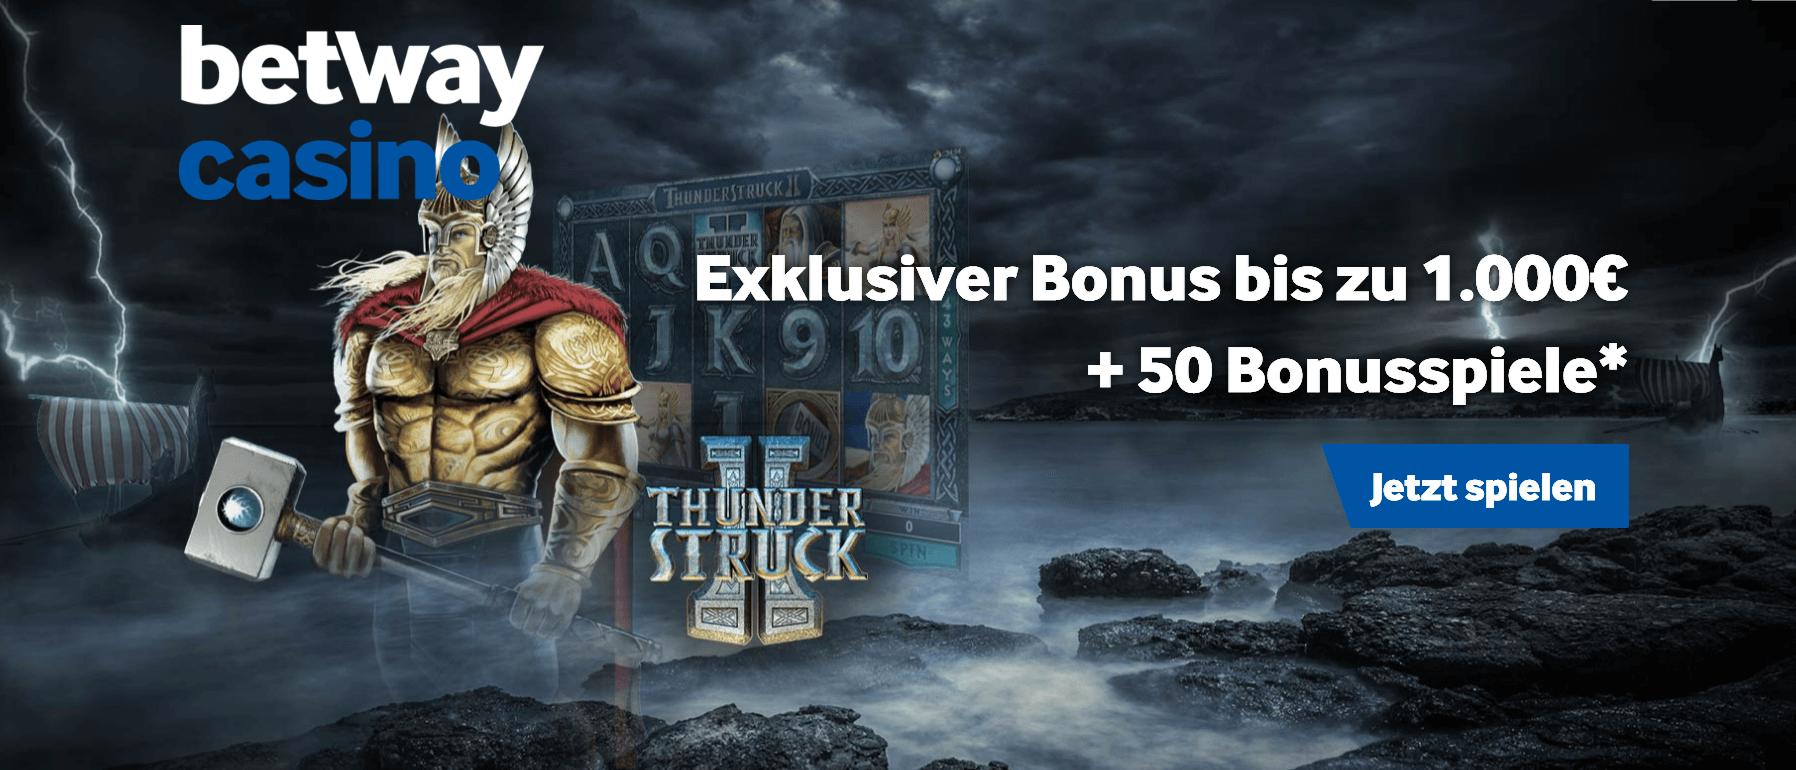 betway mit Thunderstruck Bonus